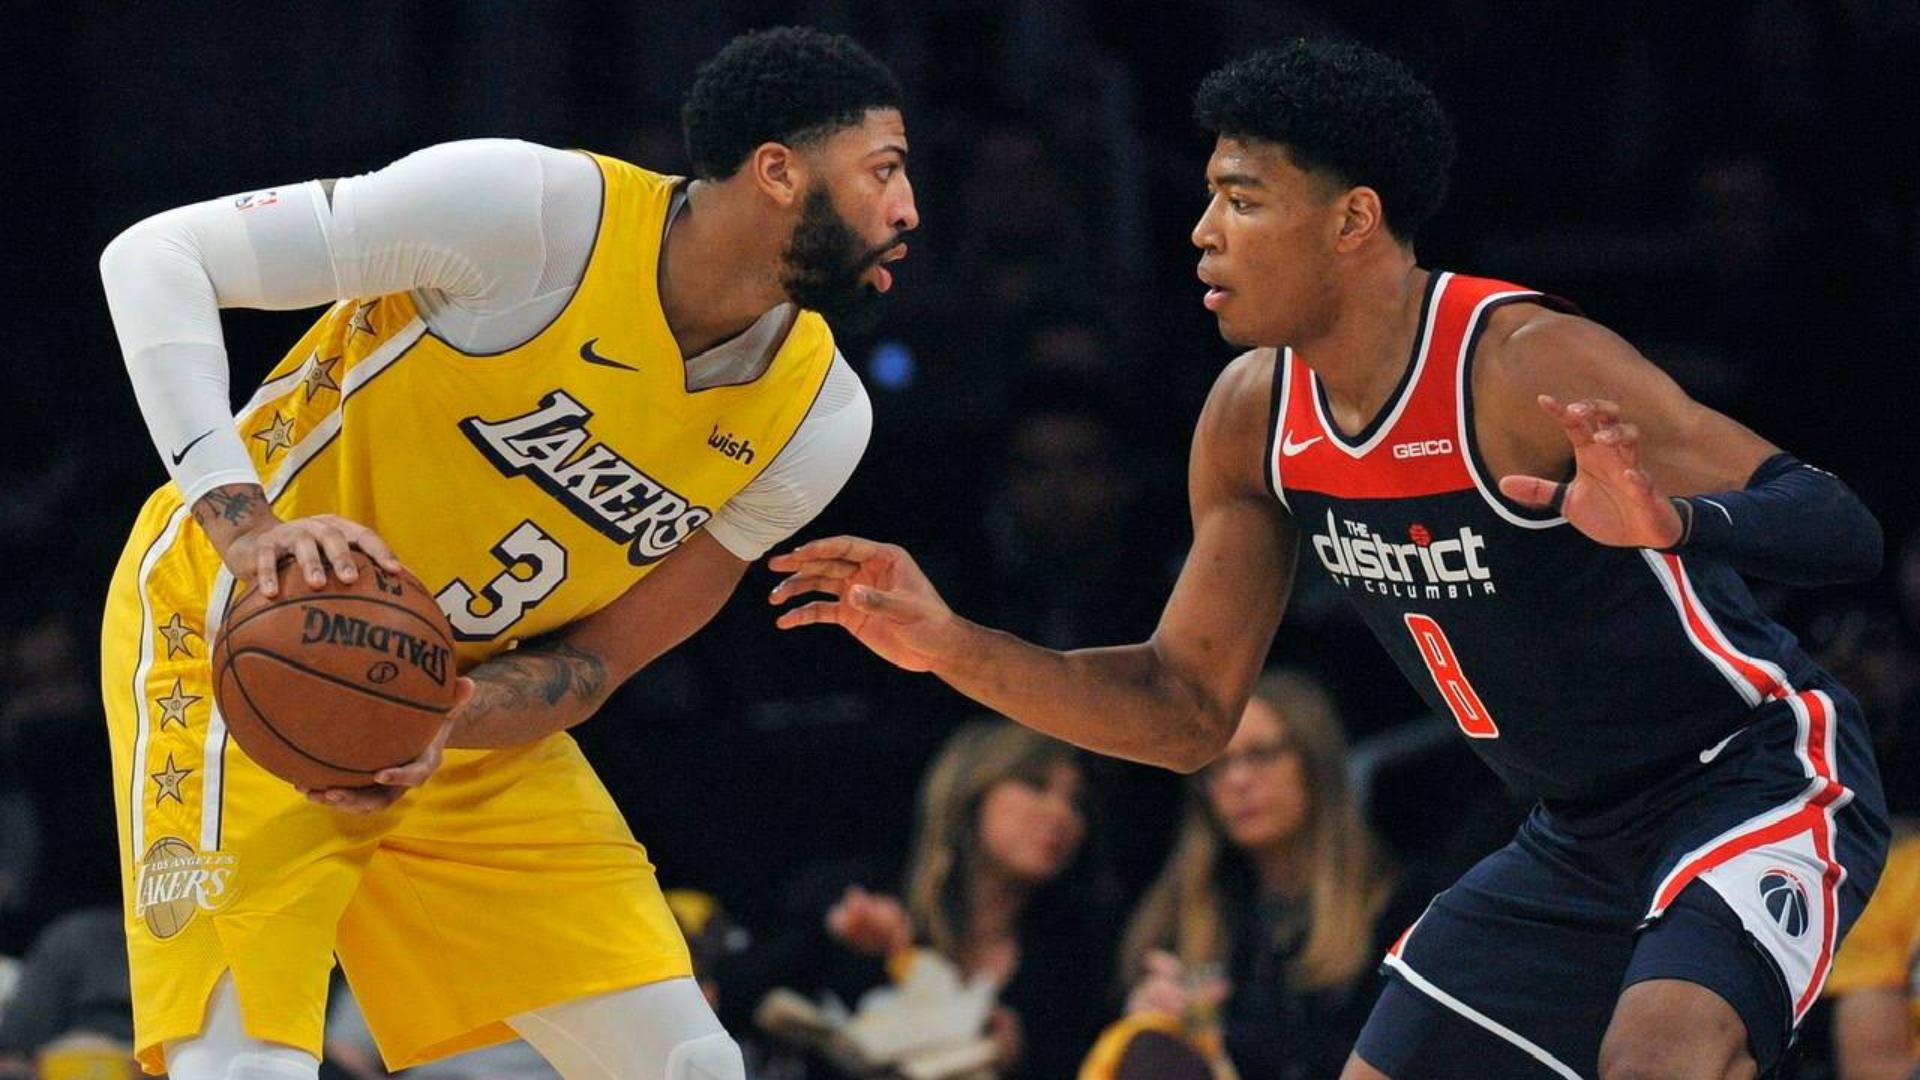 2019-2020 NBA常规赛 洛杉矶湖人 VS 华盛顿奇才 集锦Part1